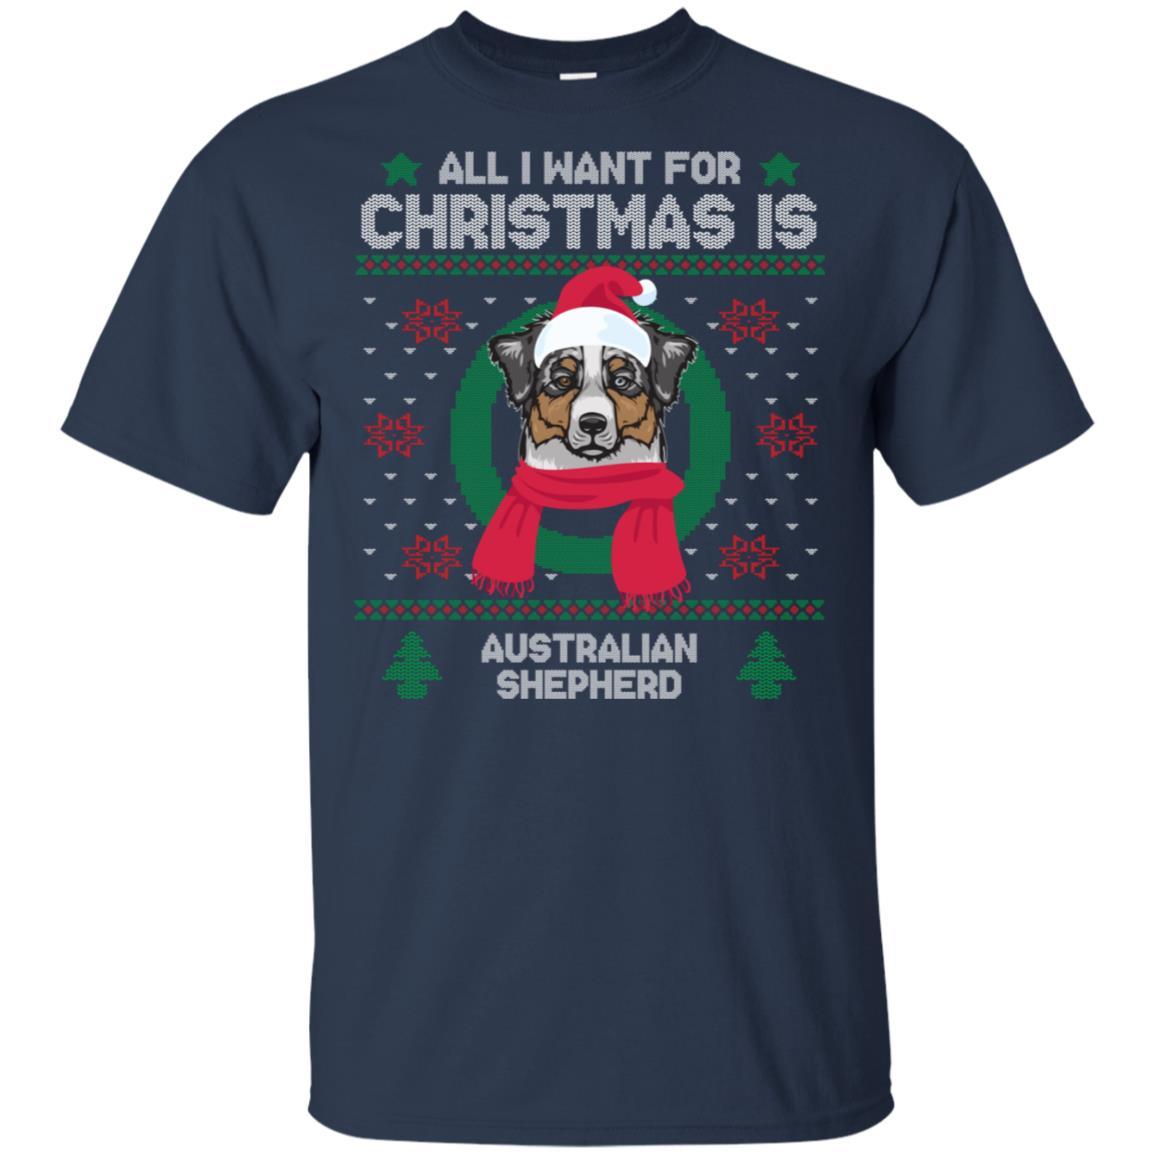 Australian Shepherd Santa Hat Ugly Sweater Xmas Unisex Short Sleeve